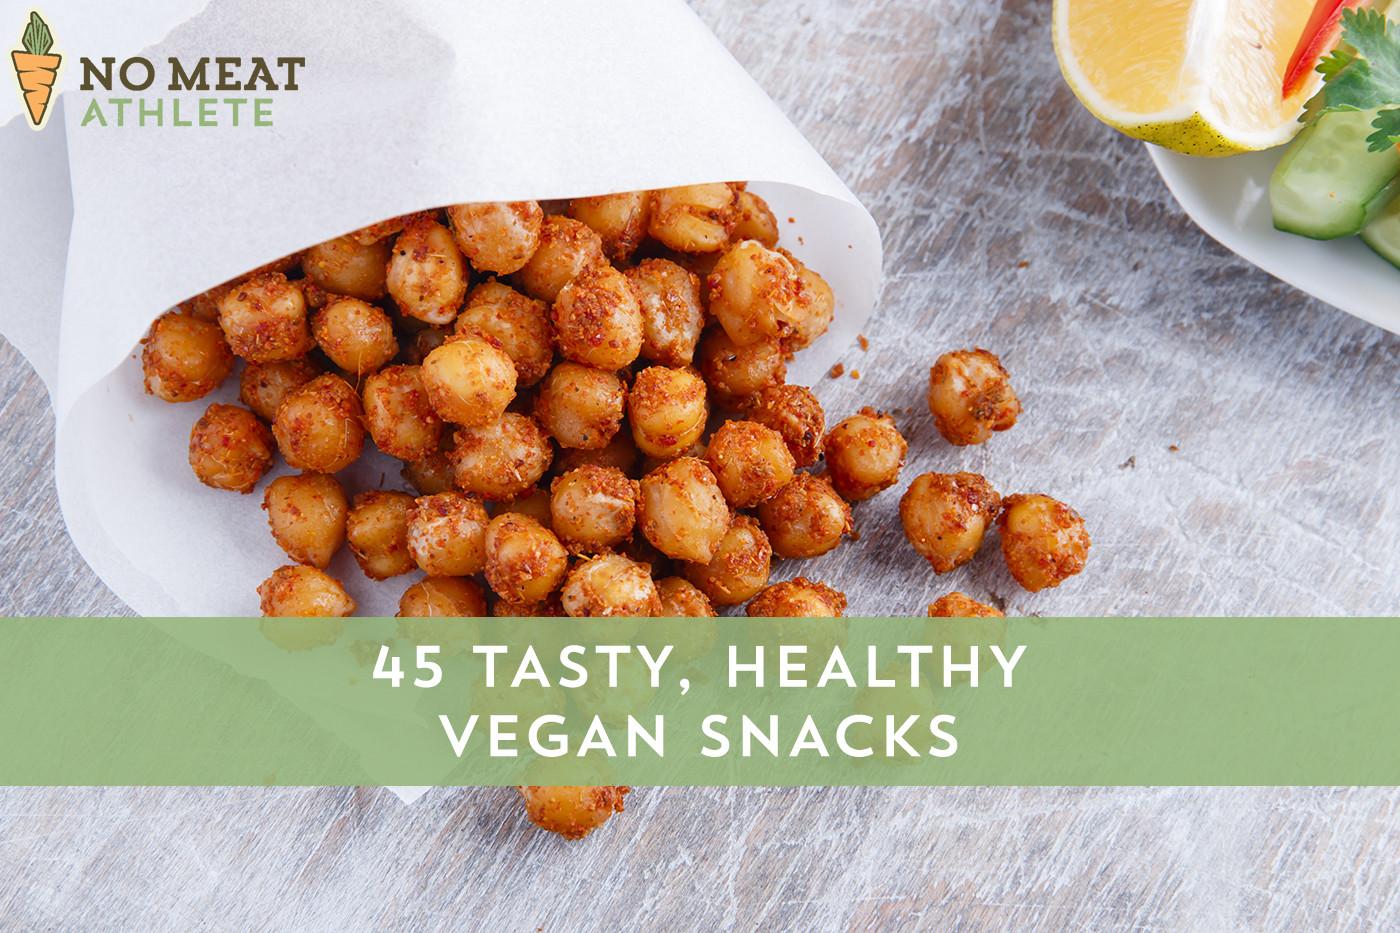 Healthy Vegan Snack Recipes  Vegan Snacks that are Healthy & Tasty